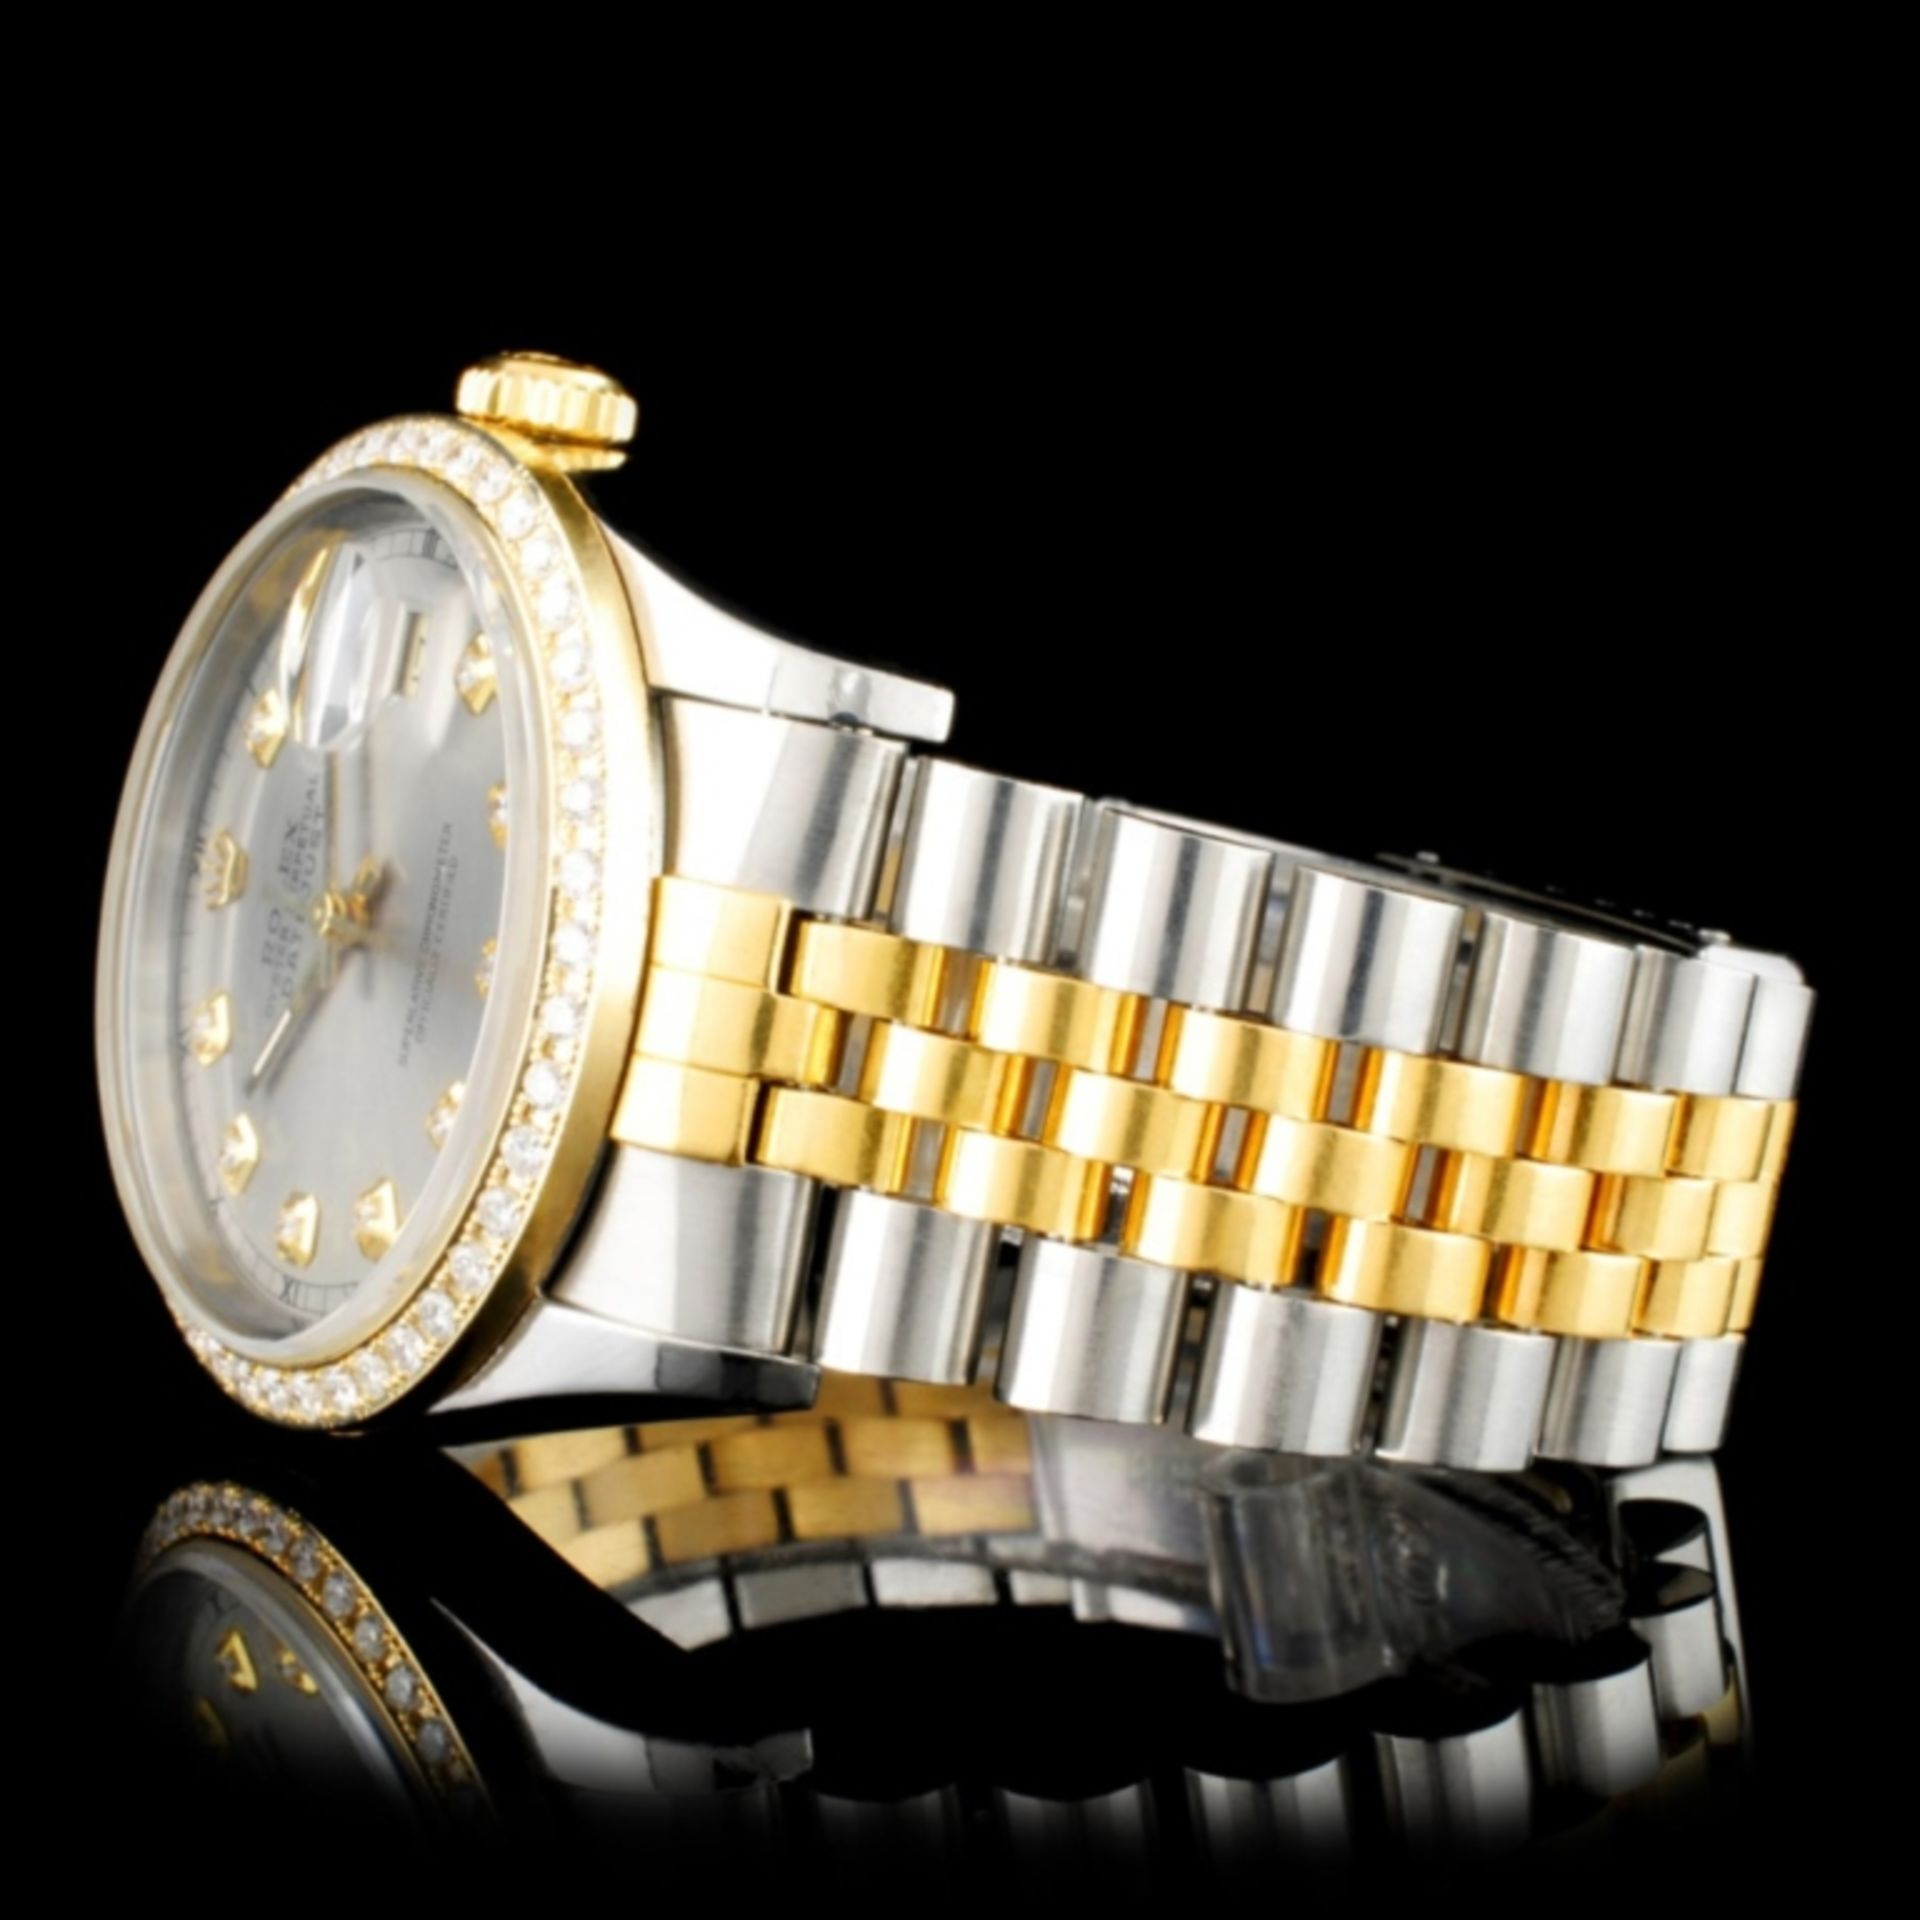 Rolex DateJust Diamond 36MM Wristwatch - Image 3 of 6